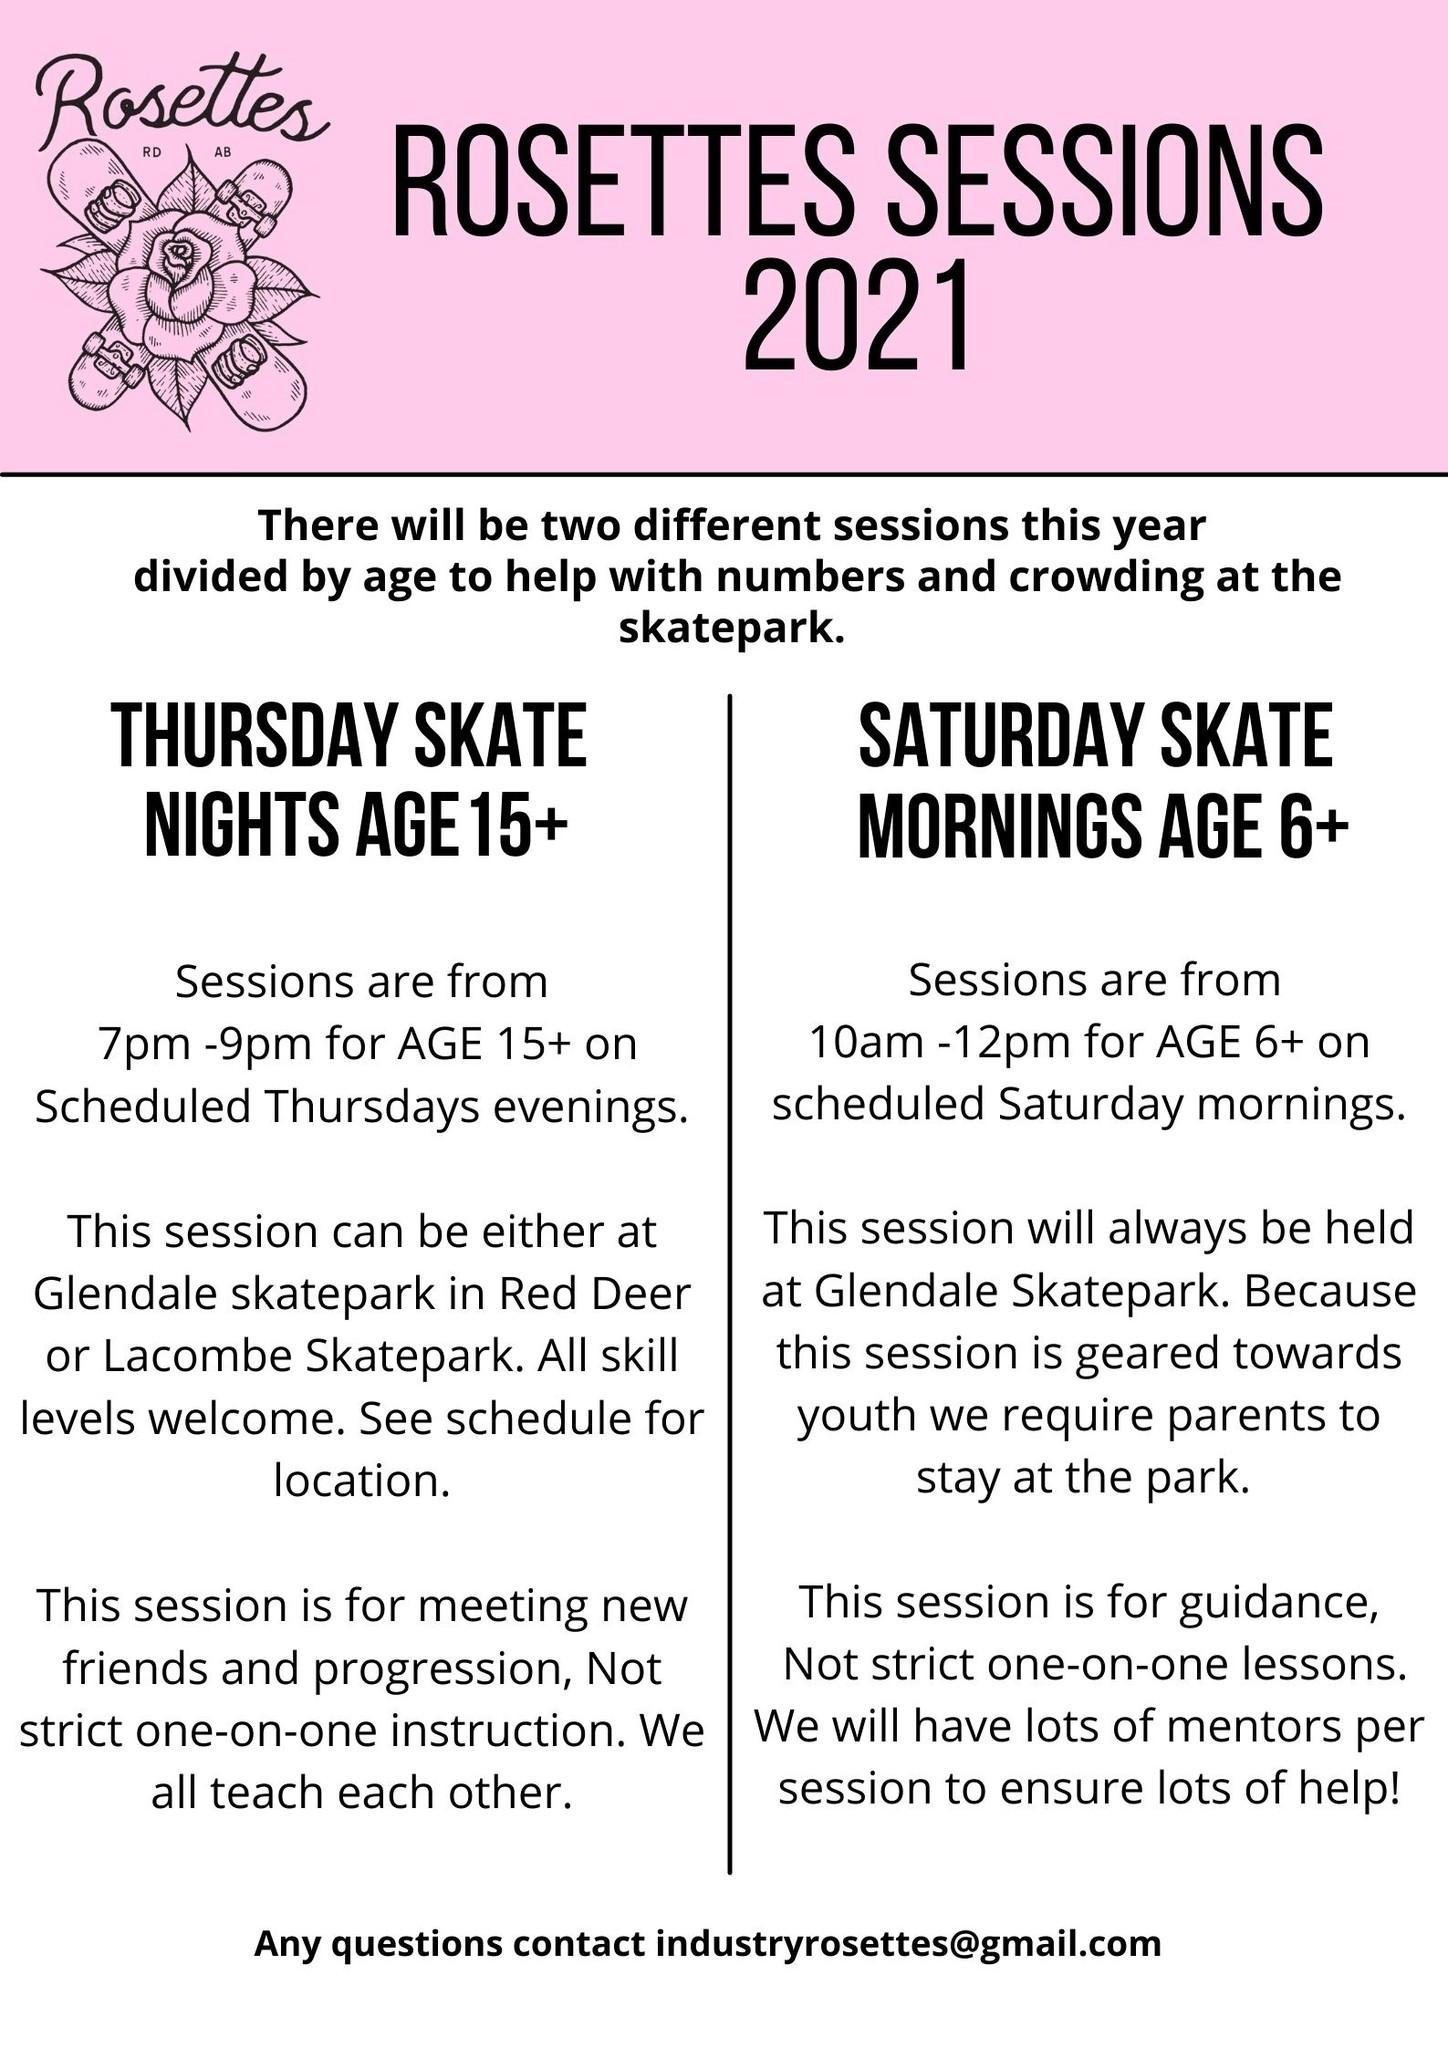 The Rosettes summer skate events for 2021